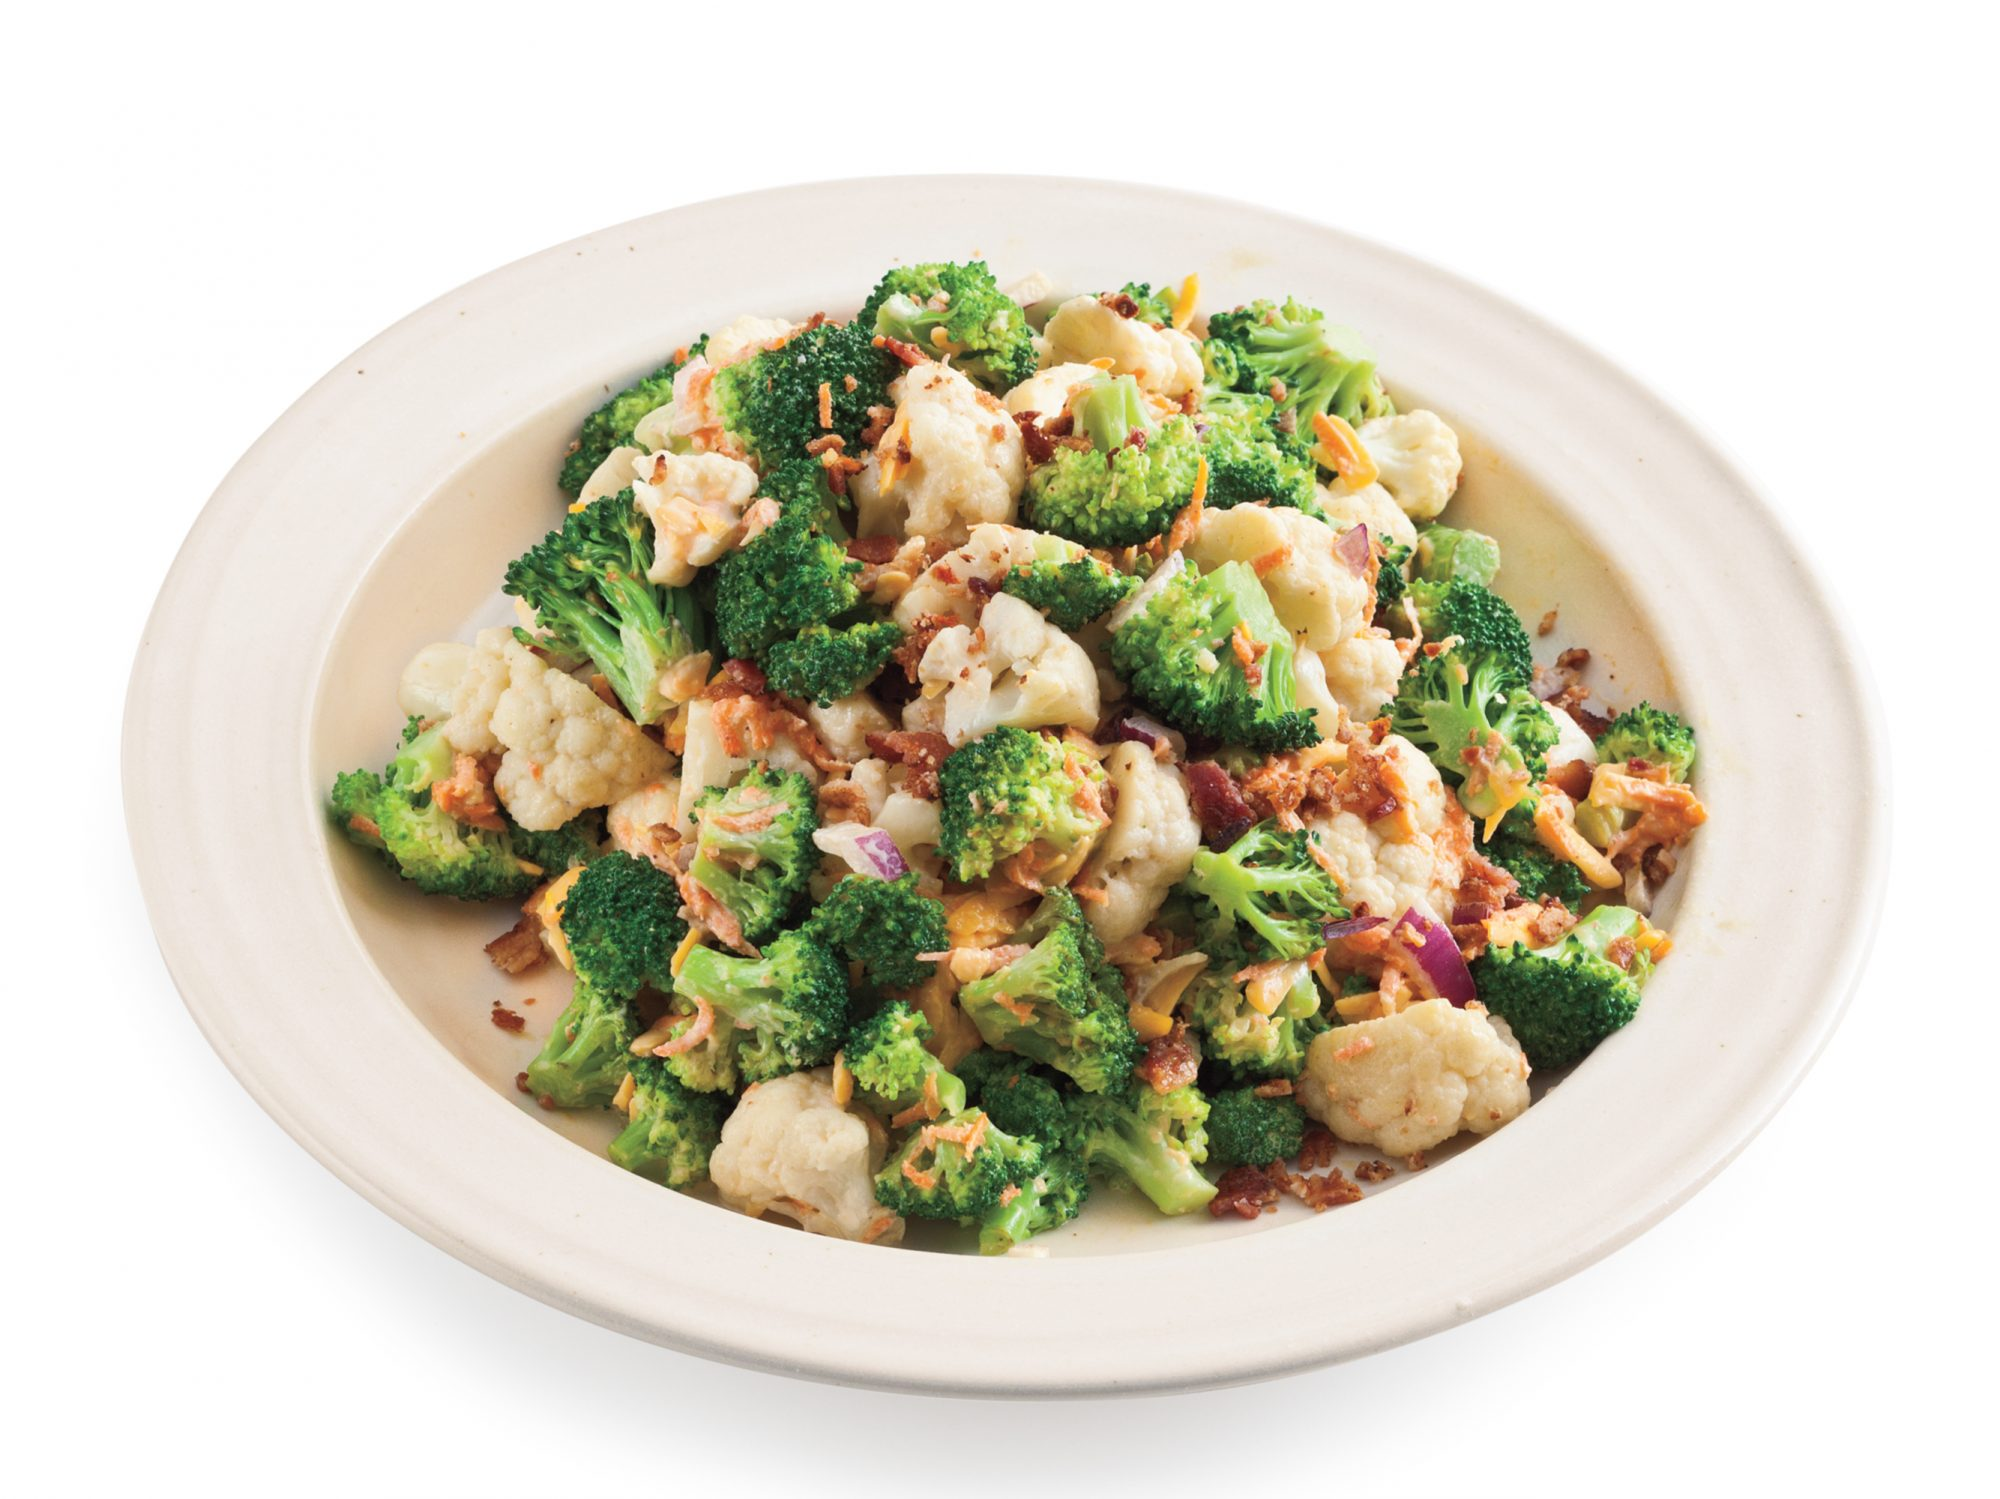 Chubba Bubba's Broccoli Salad